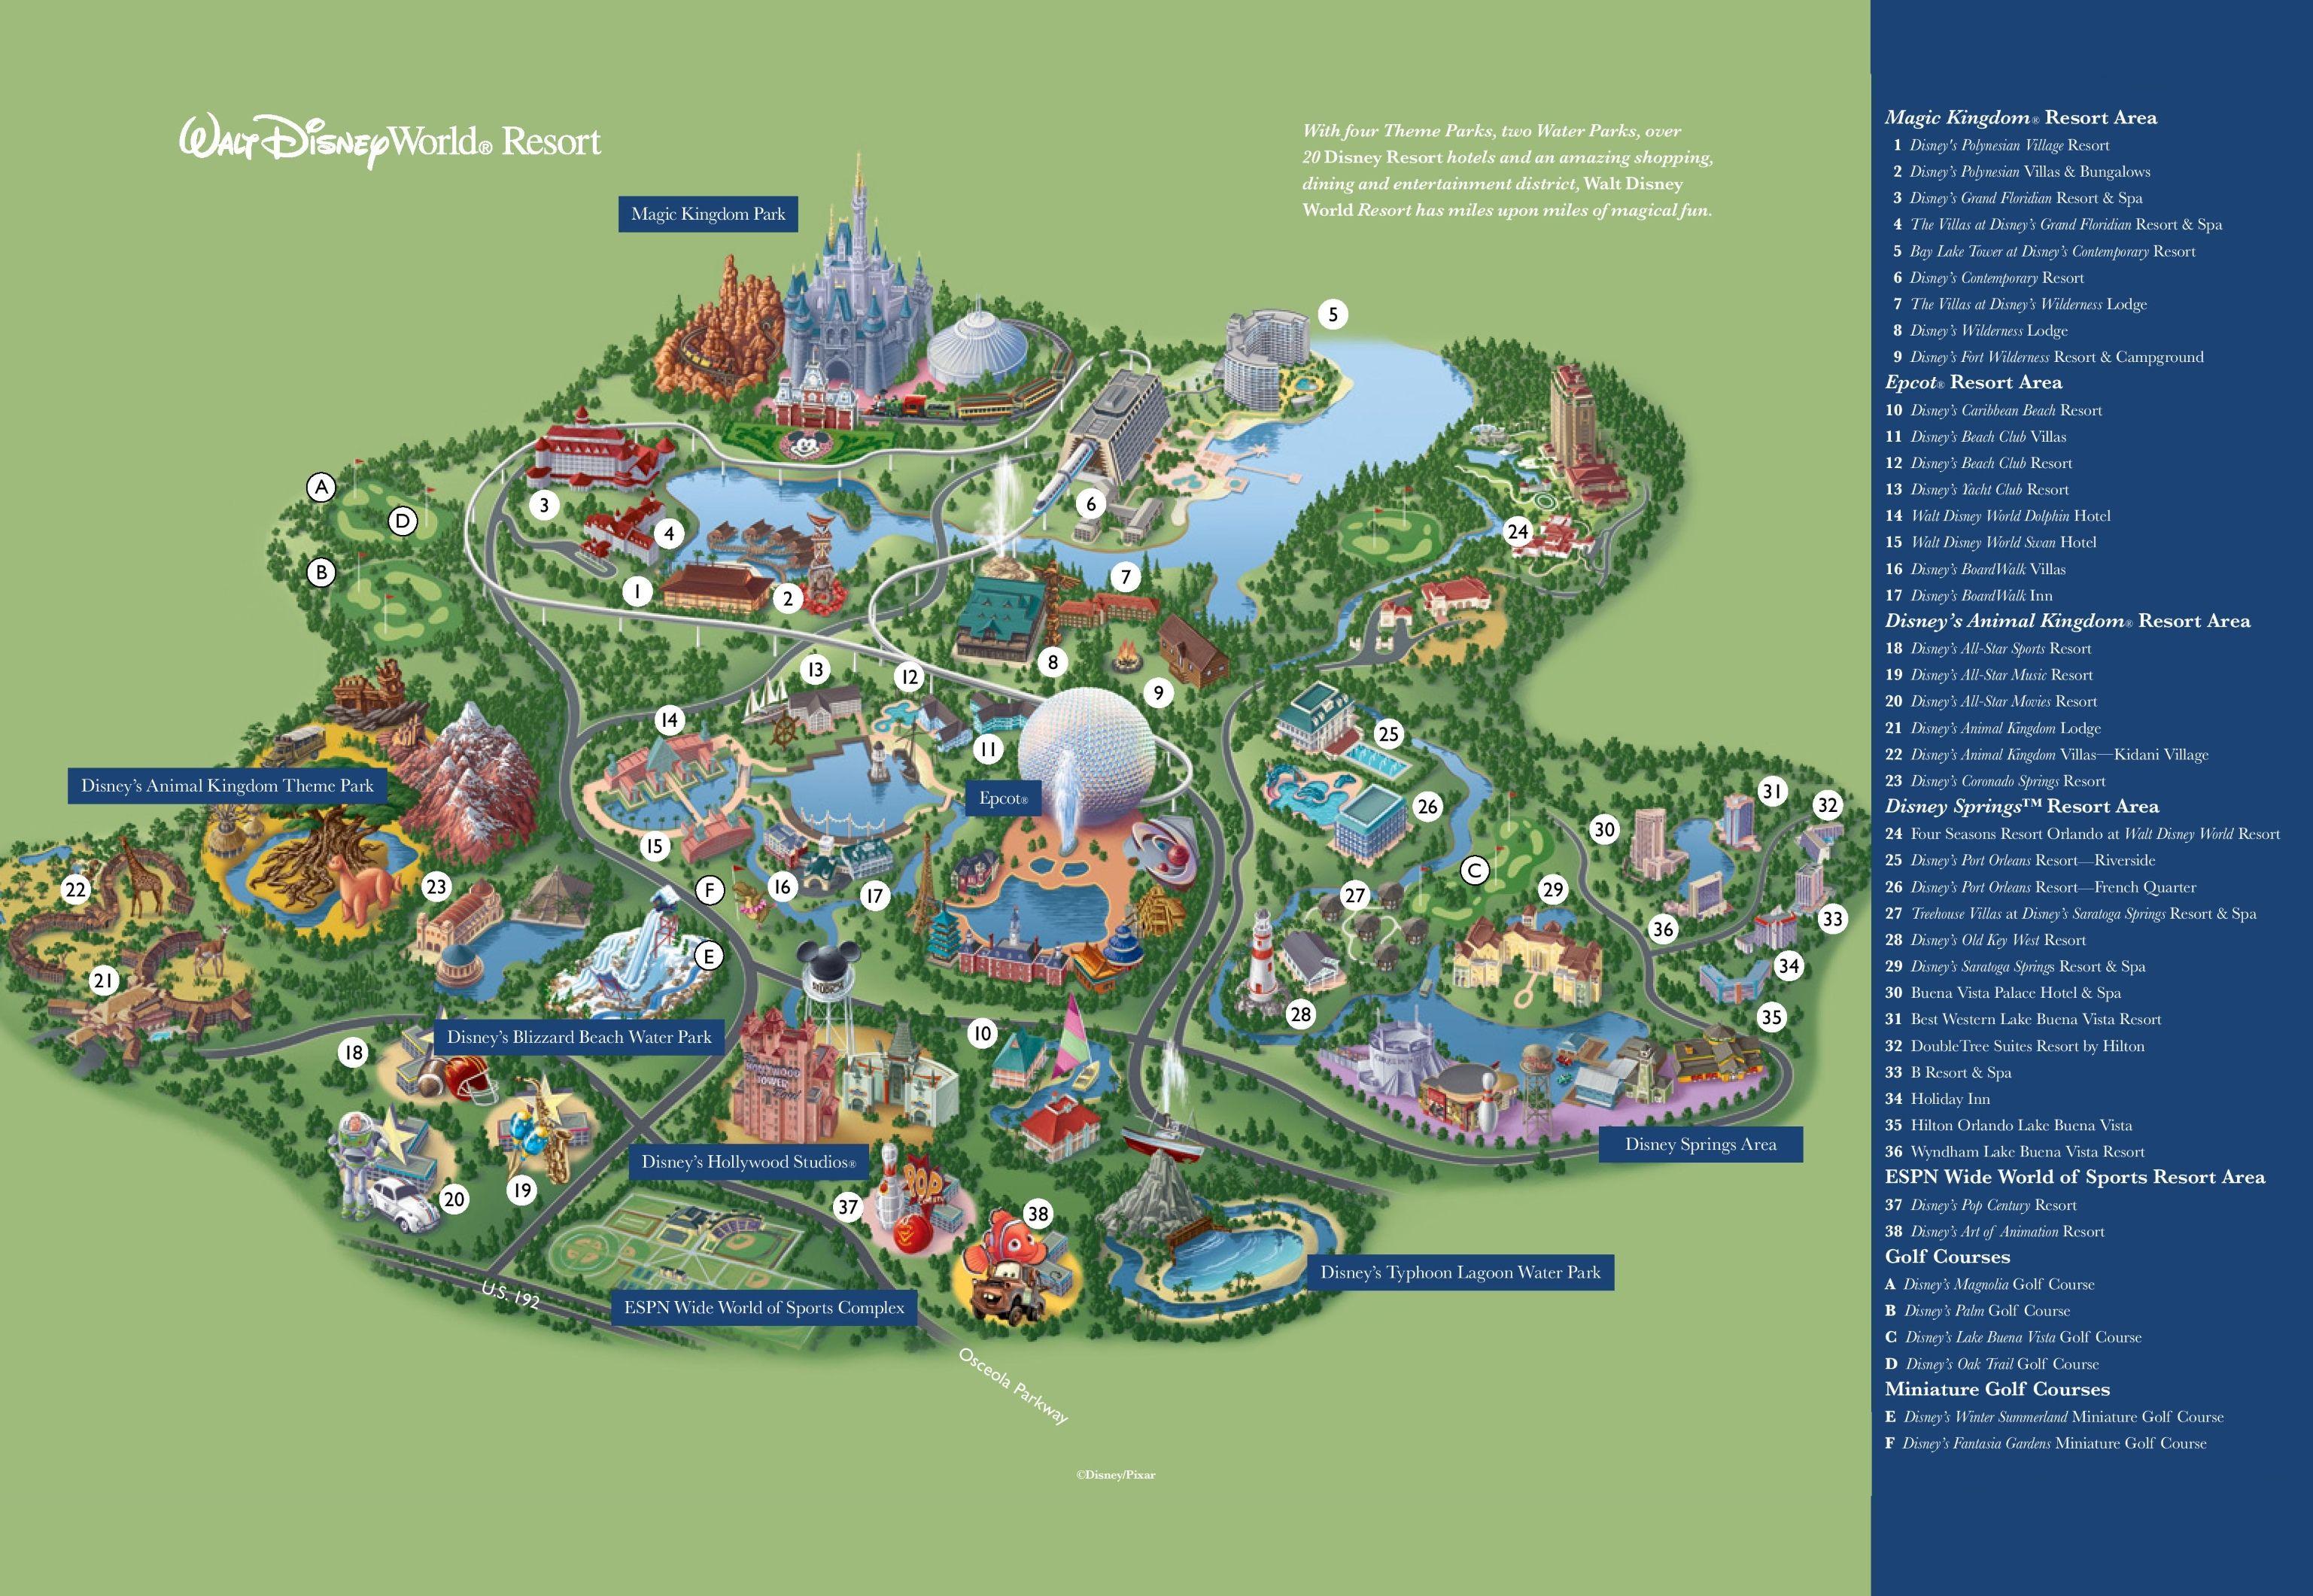 Orlando Walt Disney World Resort Map   Destination: Disney En 2019 - Disney Orlando Florida Map